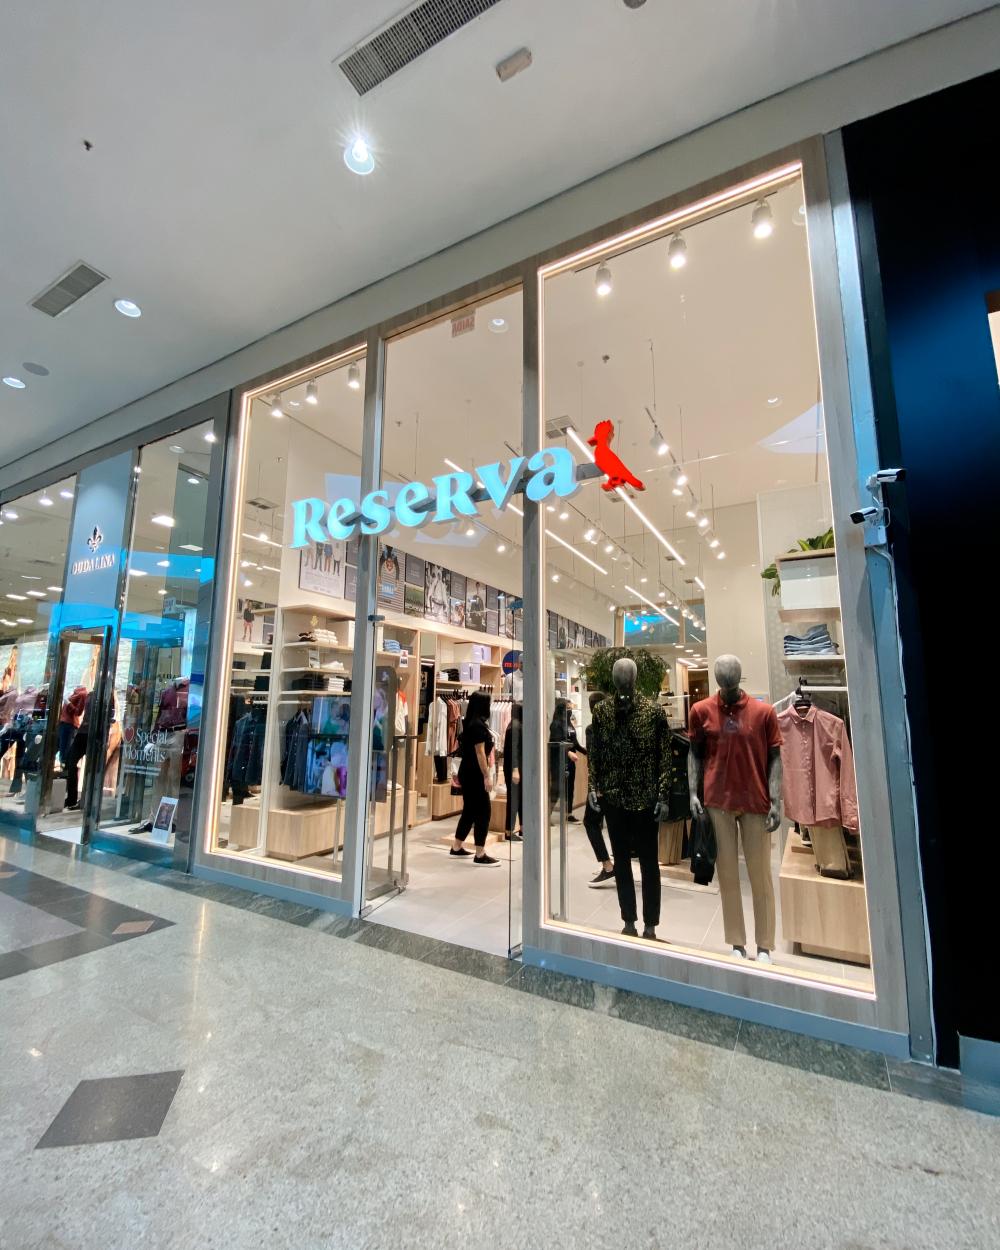 Marca carioca Reserva inaugura loja no Neumarkt Shopping